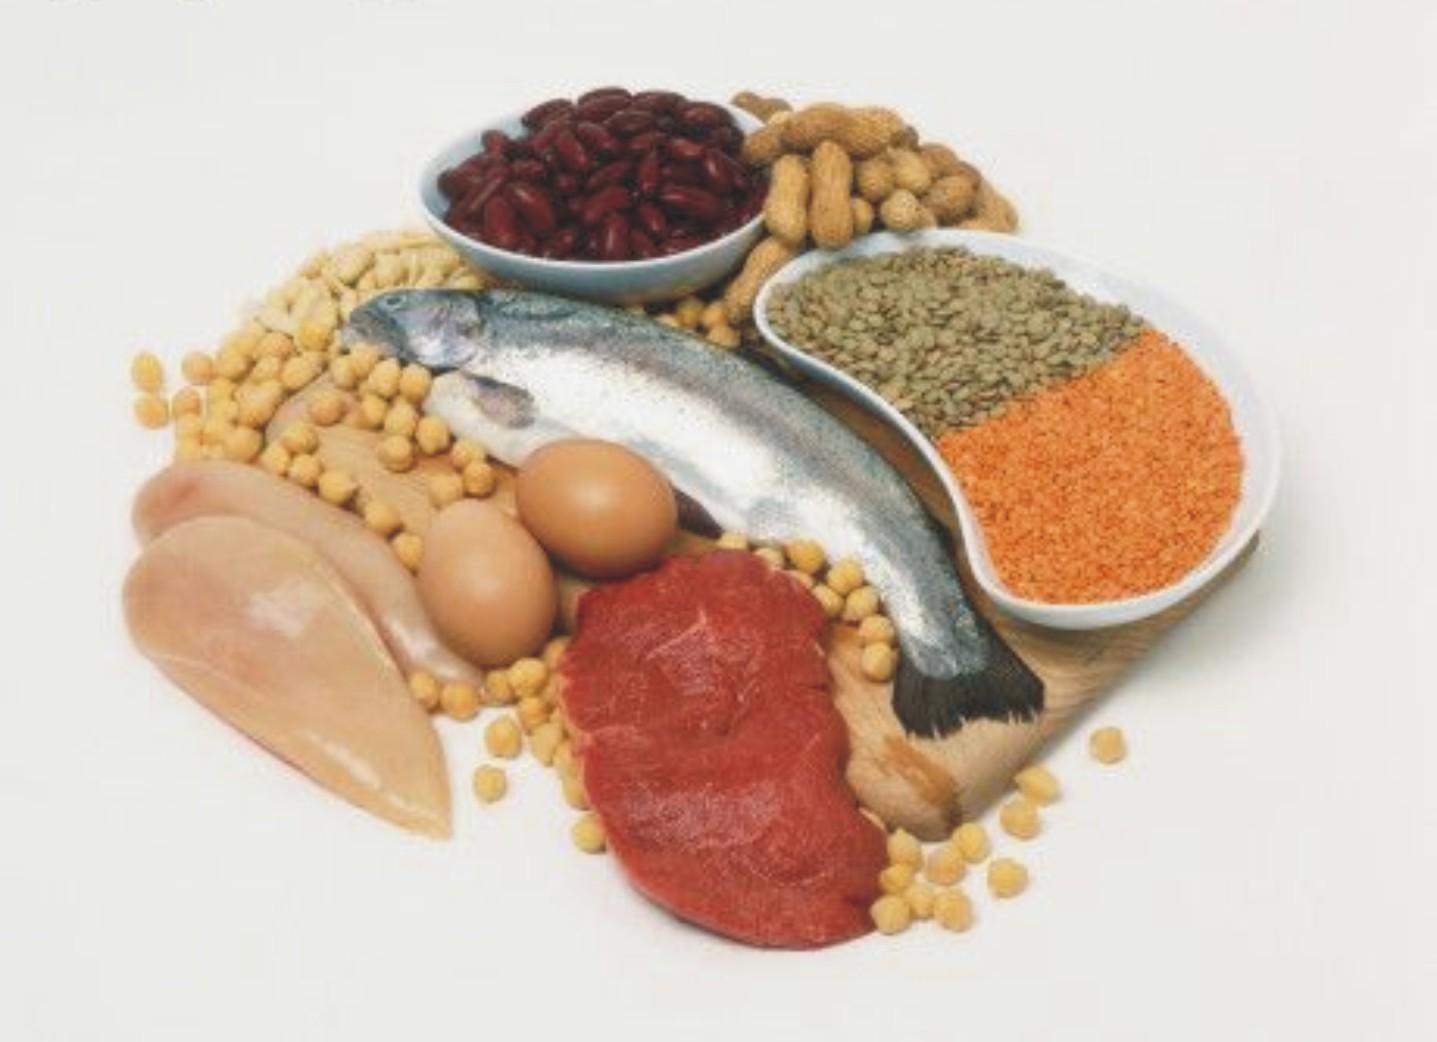 Fungsi dan Contoh Makanan Yang Banyak Mengandung Protein